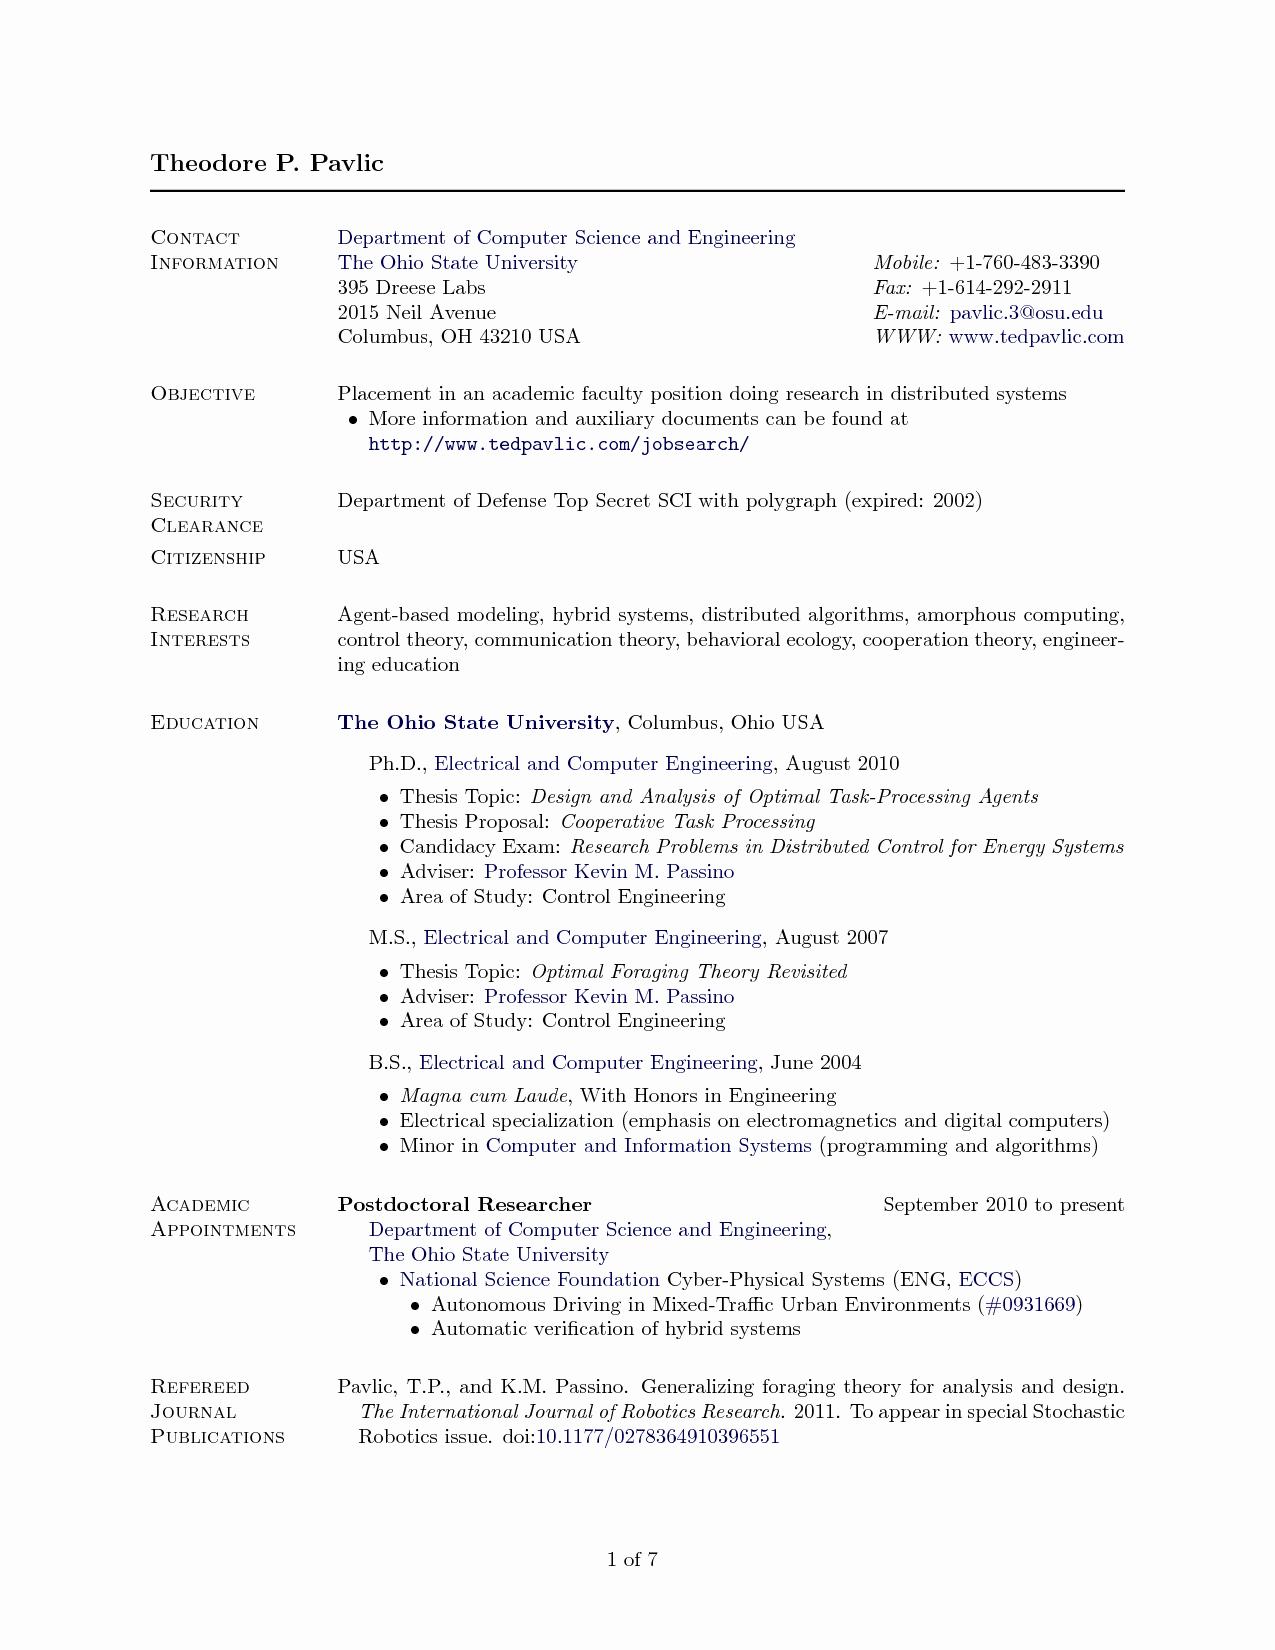 Latex Resume Template Puter Science